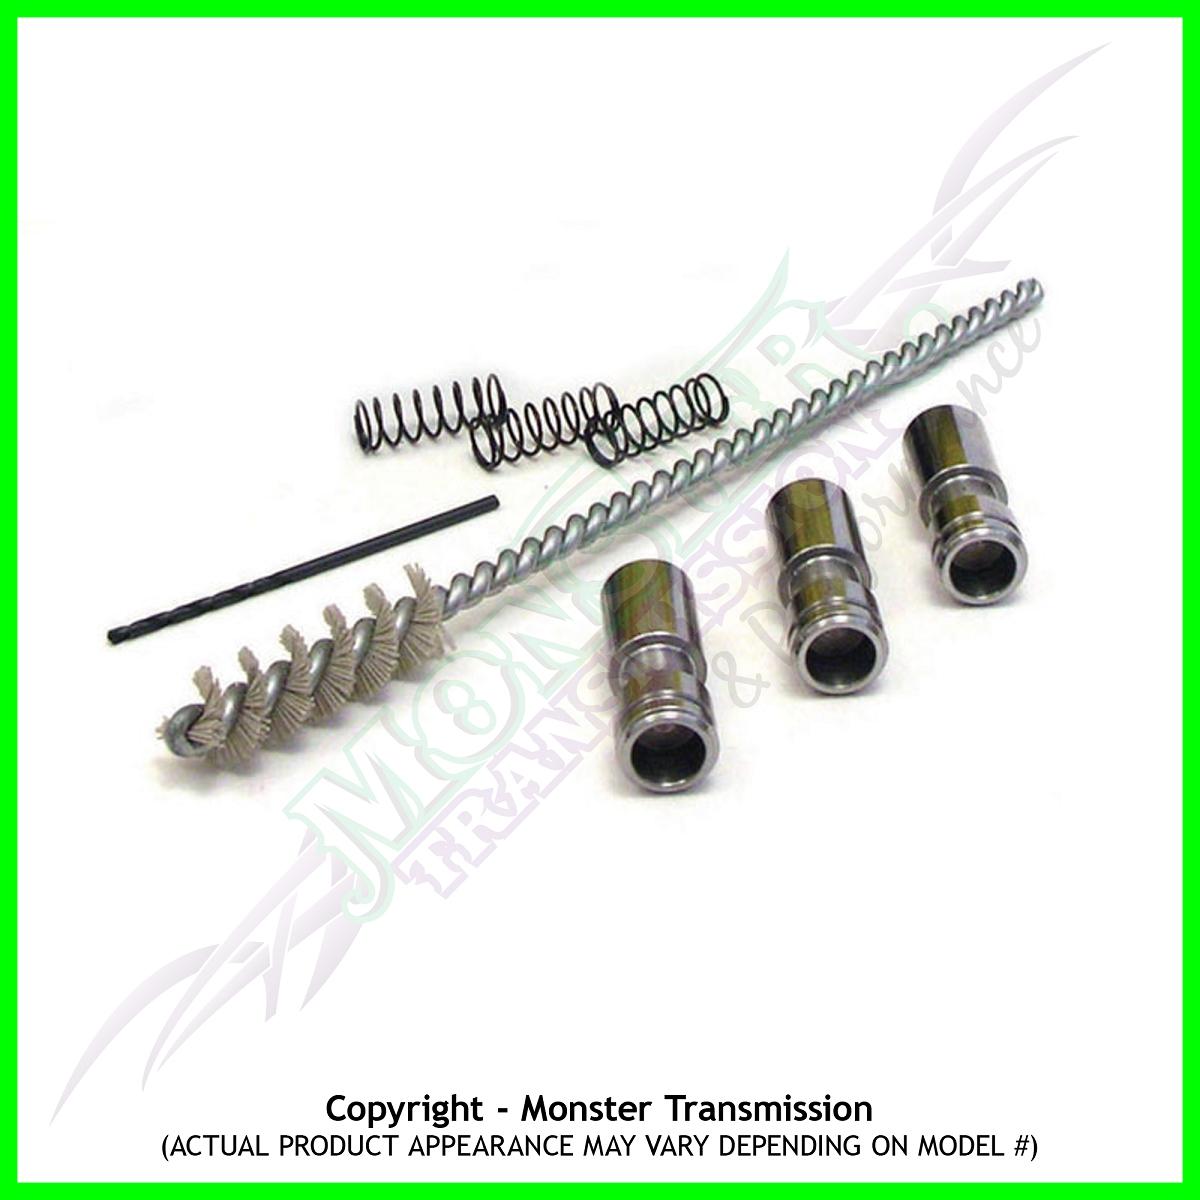 Superior | E40D Accumulator Body Repair Kit